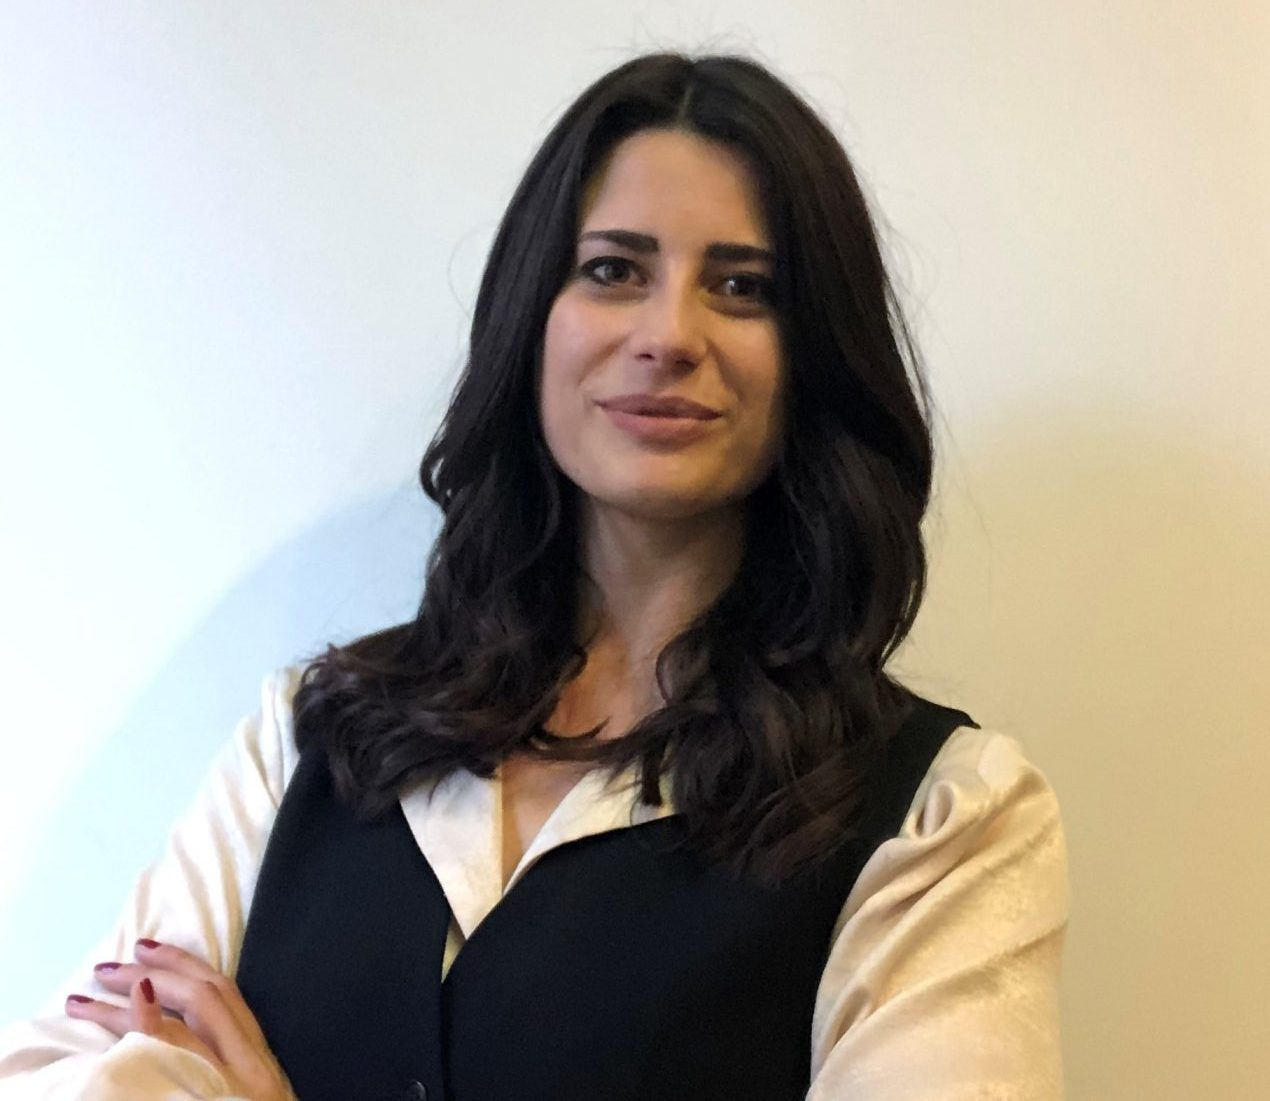 Eleonora Emiliani